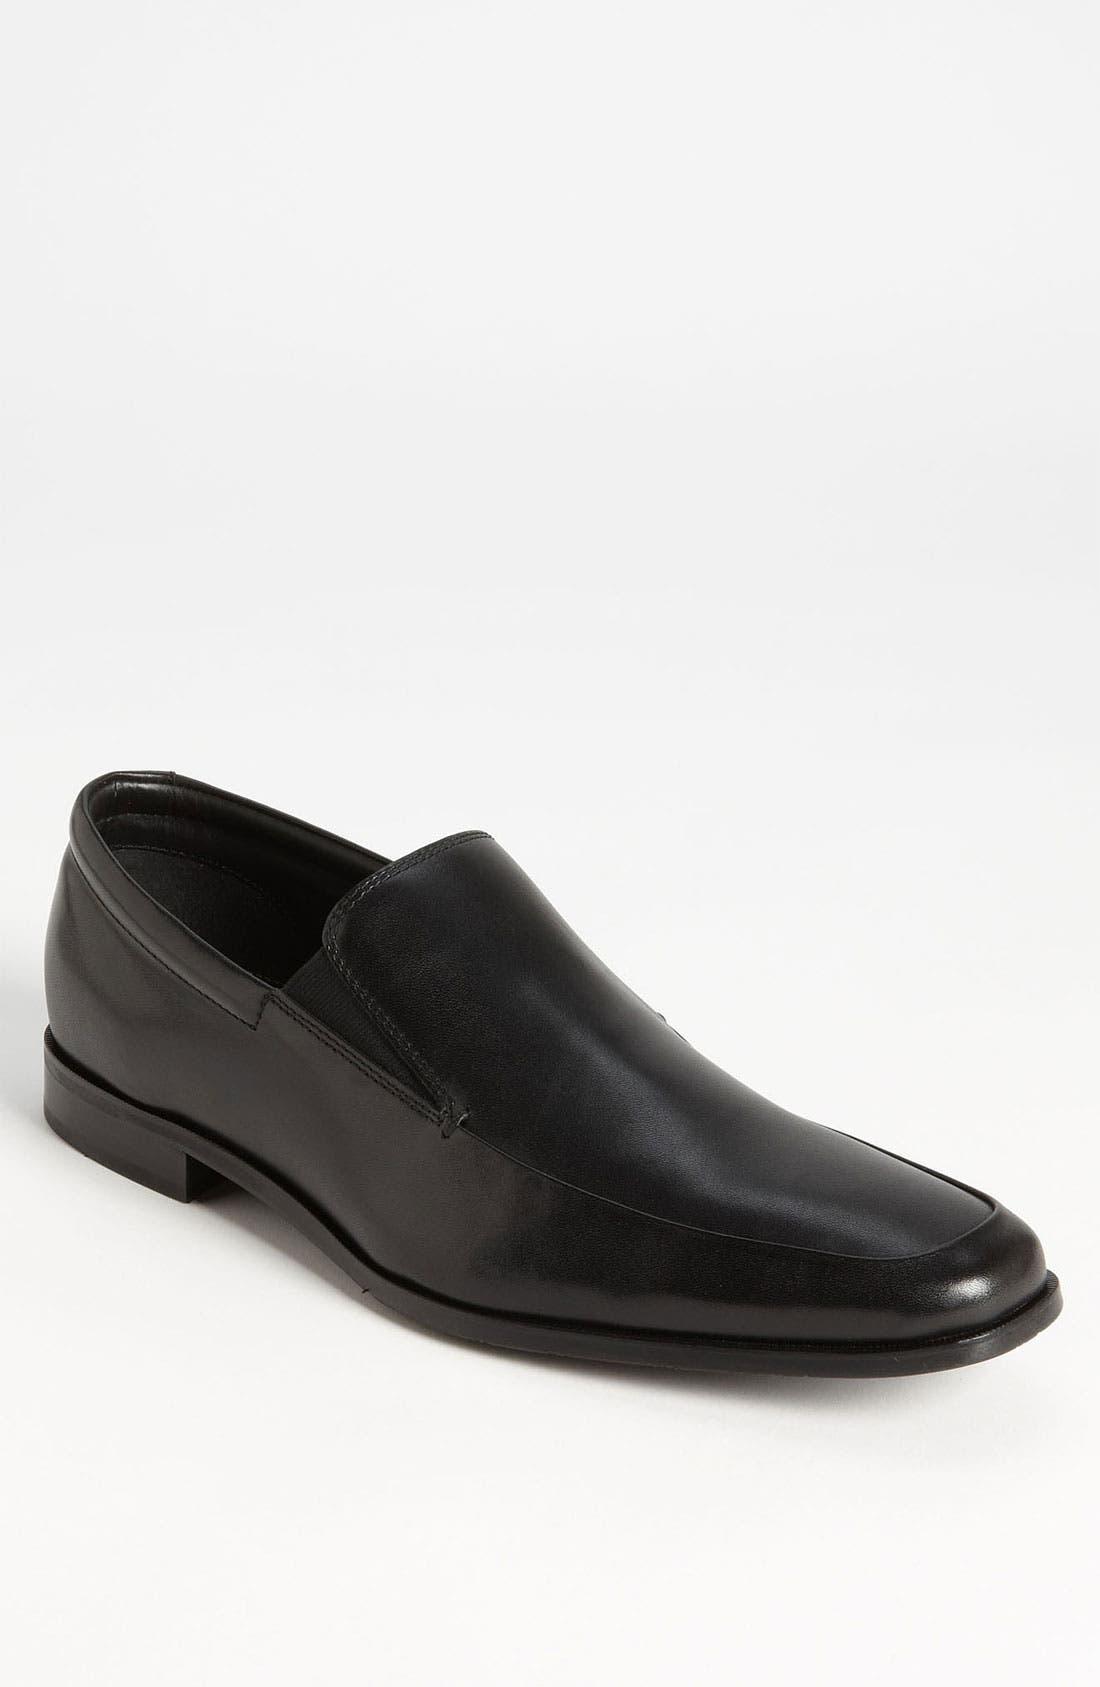 GORDON RUSH Men'S Elliot Leather Apron Toe Loafers in Black Leather